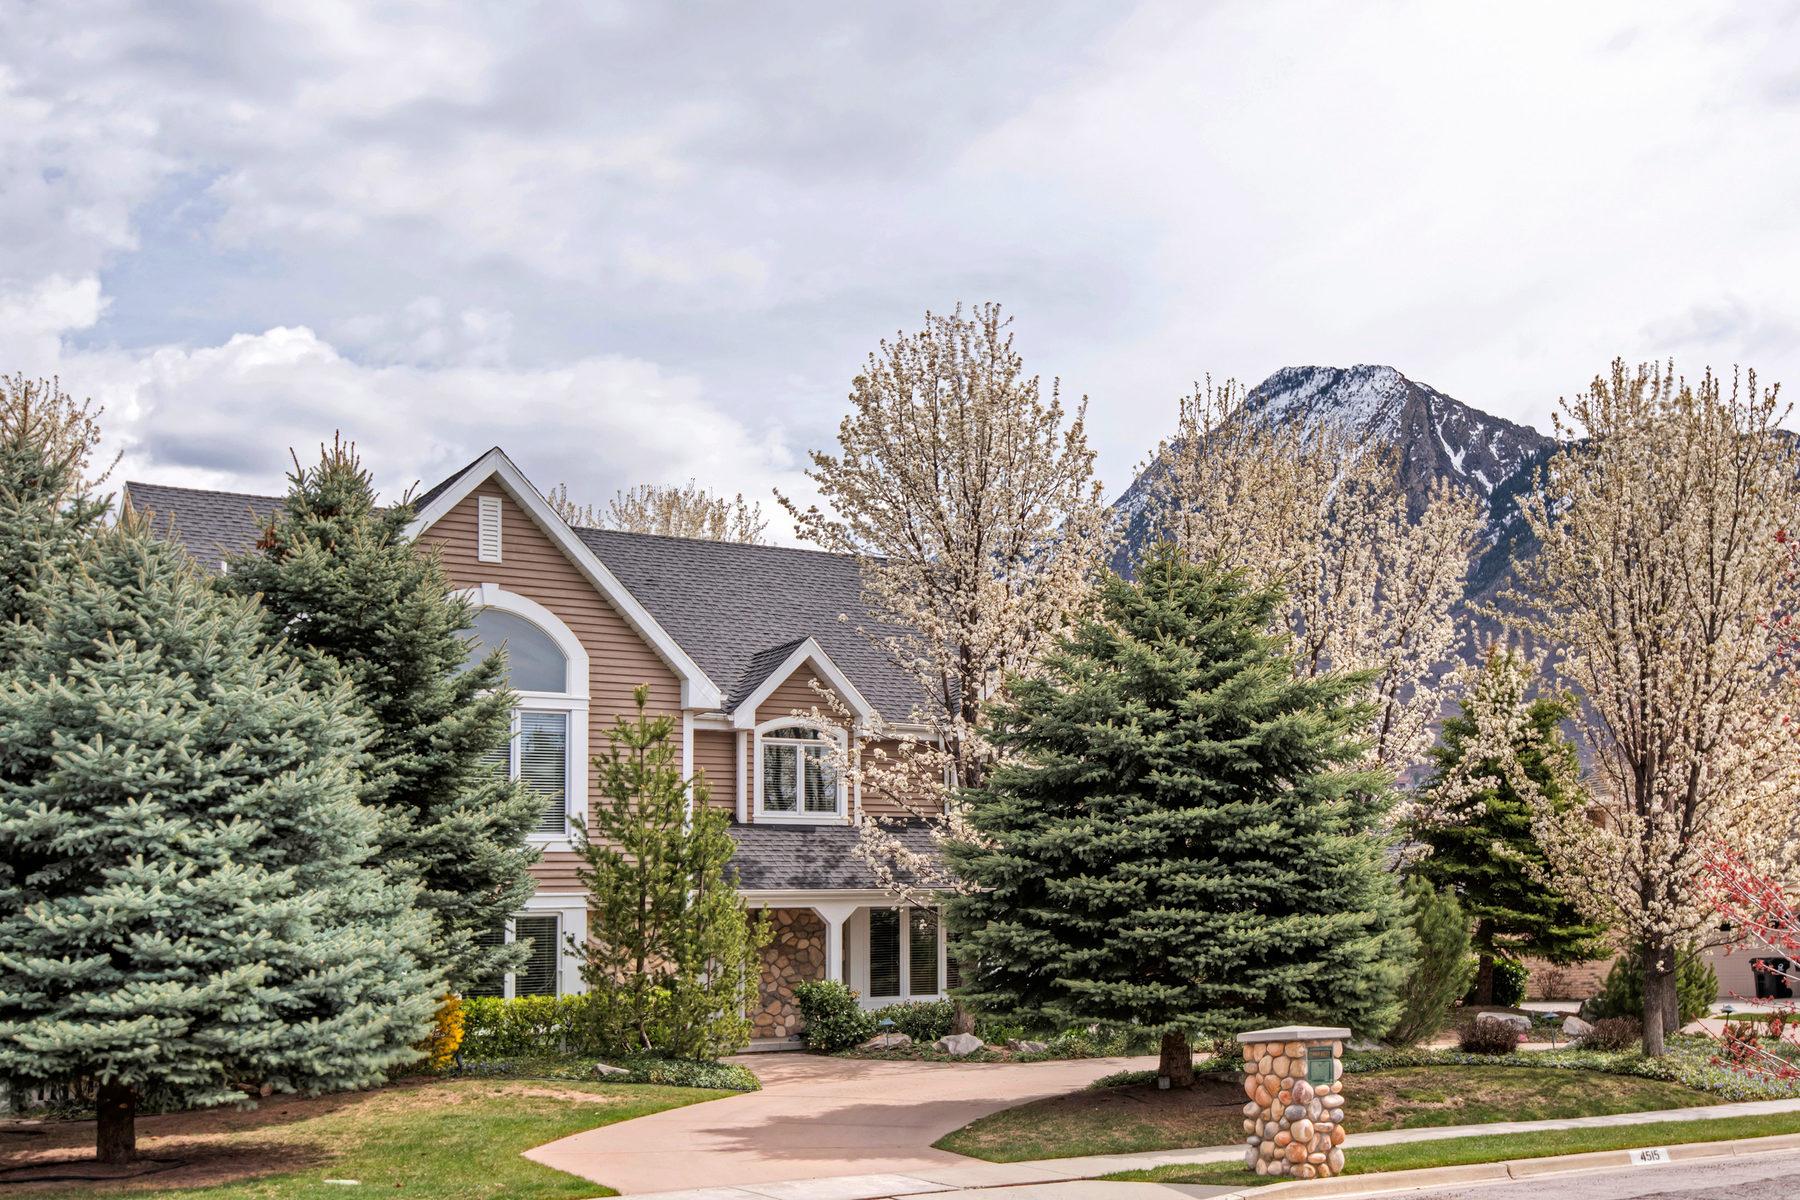 Частный односемейный дом для того Продажа на Immaculate Holladay Two-Story 4515 S Butternut Rd Salt Lake City, Юта, 84117 Соединенные Штаты